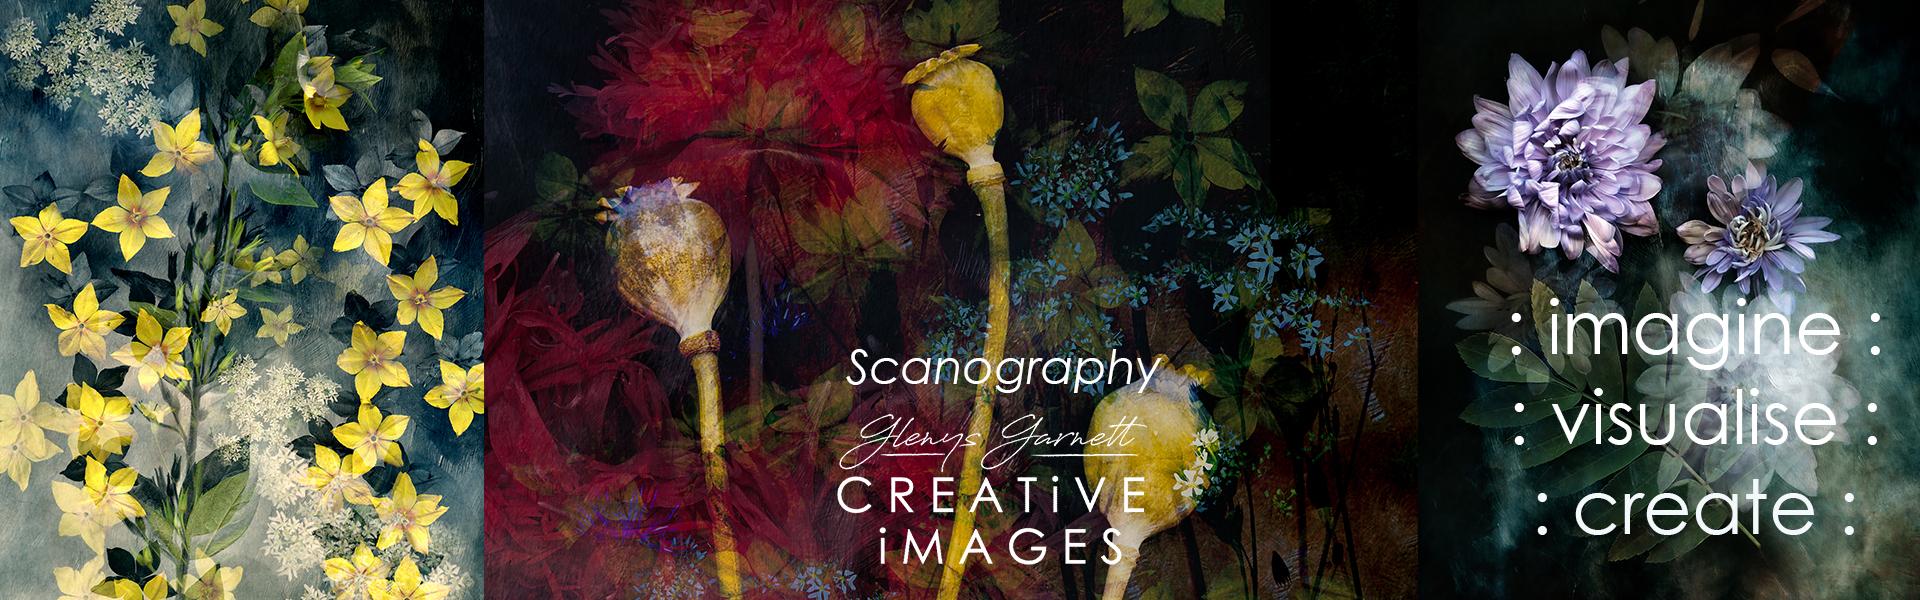 Glenys Garnett Creative Images